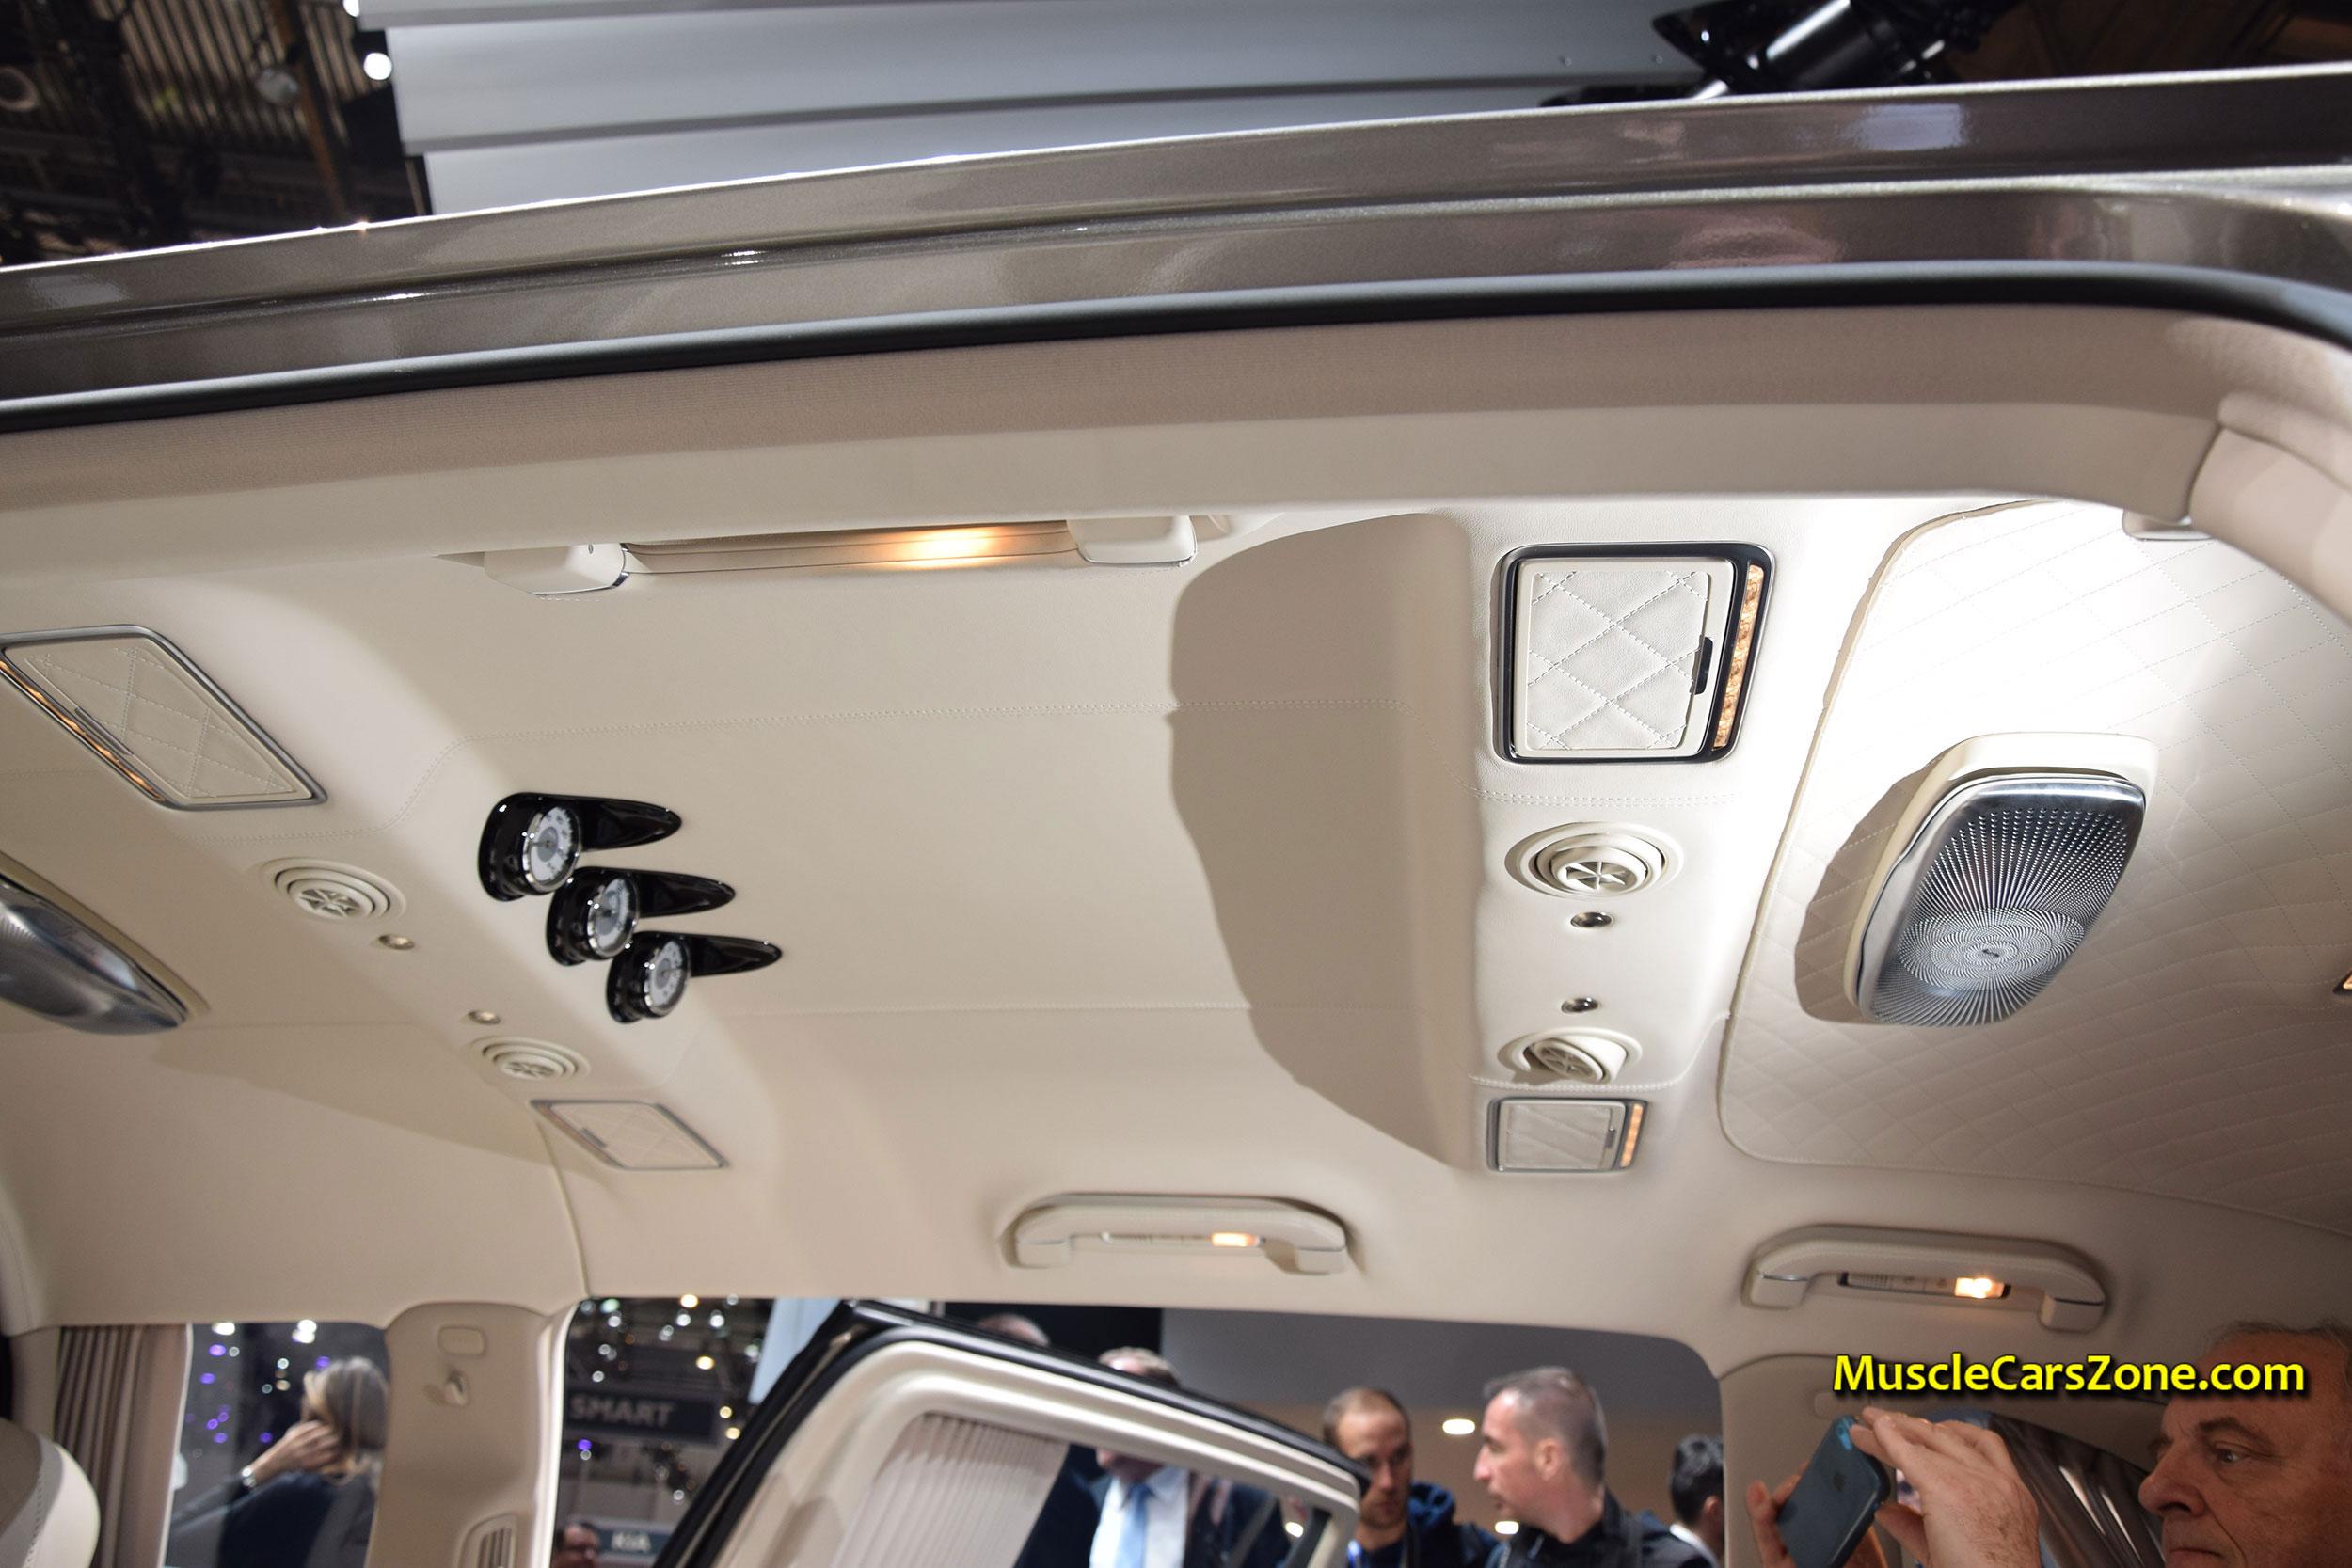 http://www.musclecarszone.com/wp-content/uploads/2015/03/2015-Mercedes-Maybach-S600-Pullman-Interior-07-2015-Geneva-Motor-Show.jpg